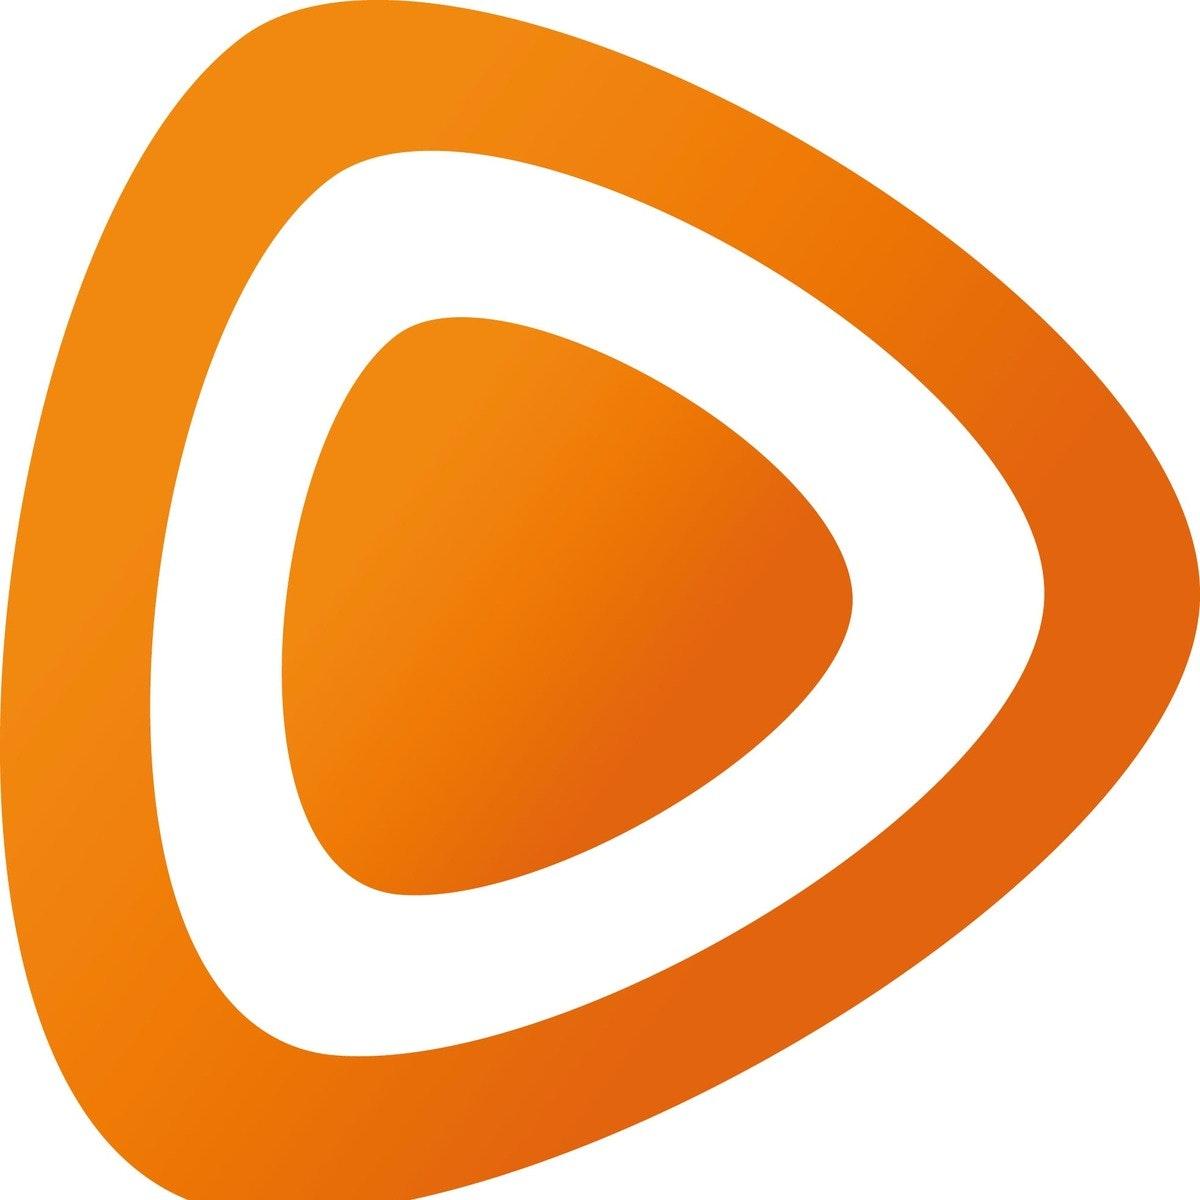 own3d media GmbH